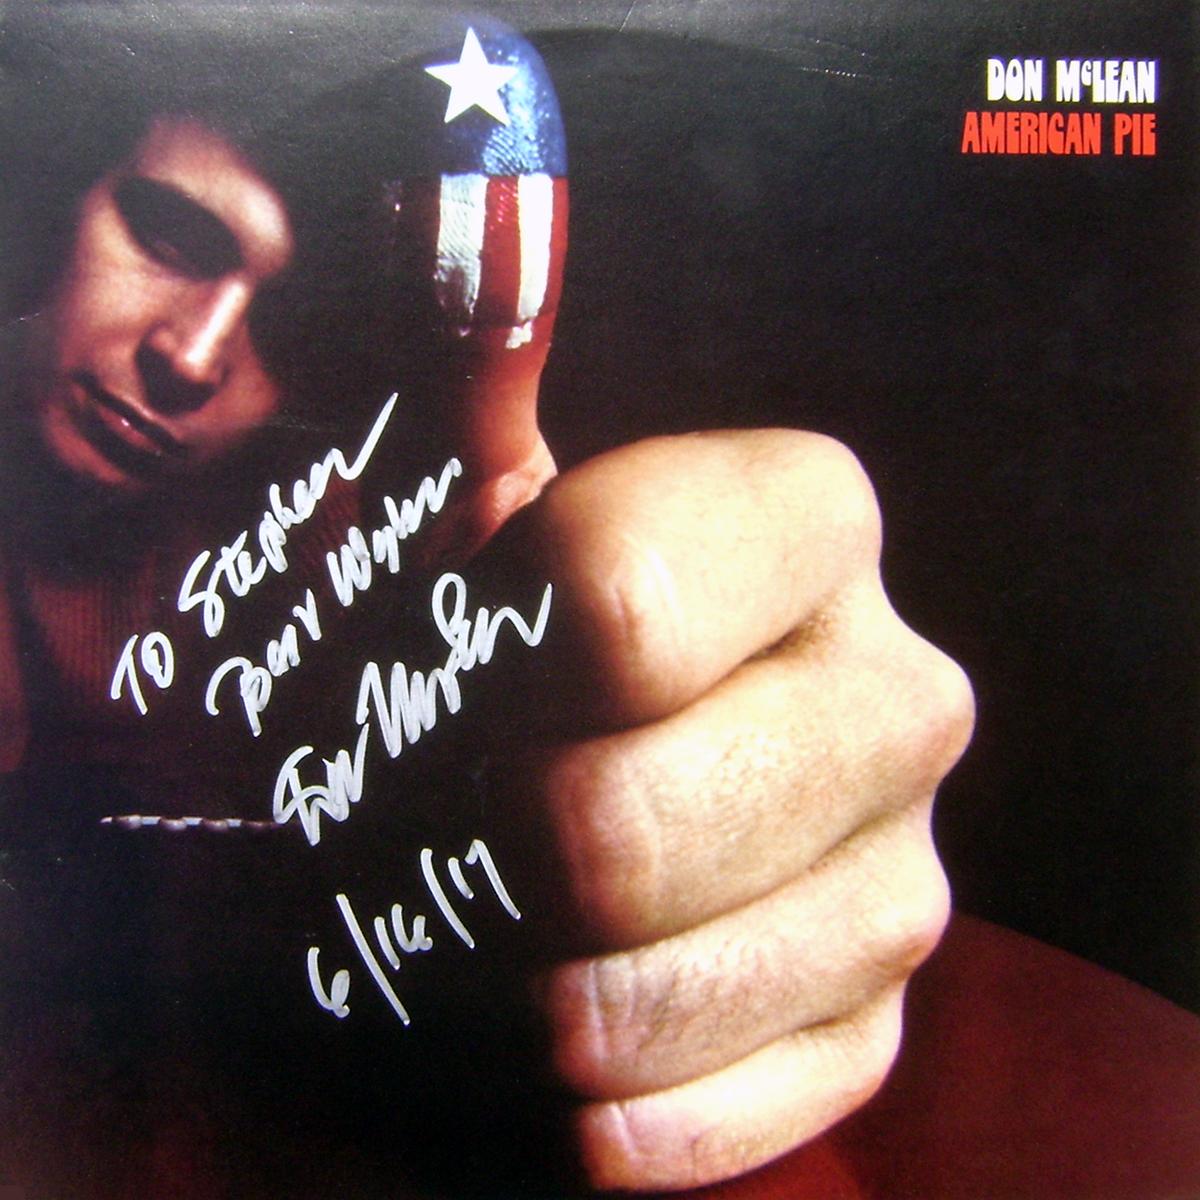 LP - Don McLean - American Pie